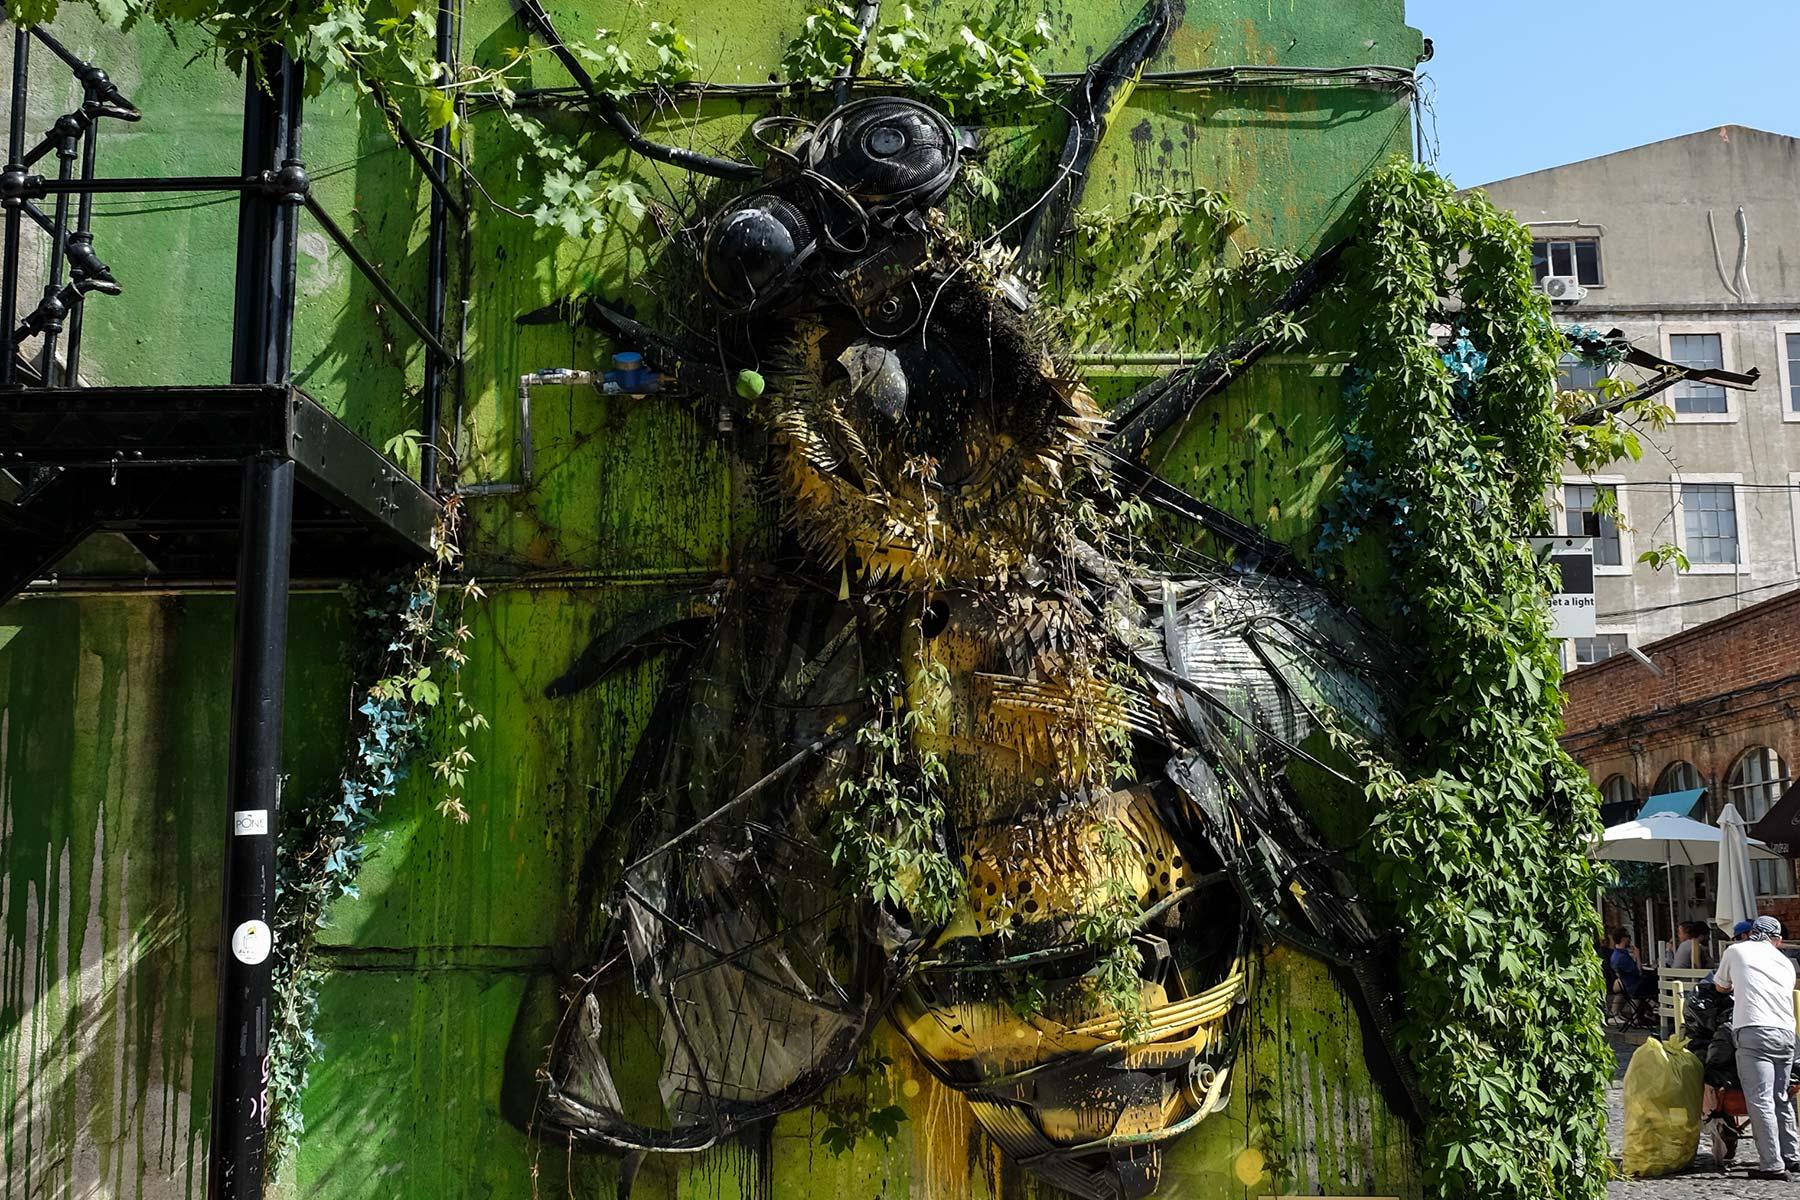 Honigbiene Installation des Künstlers Bordalo II in Lissabon, Portugal